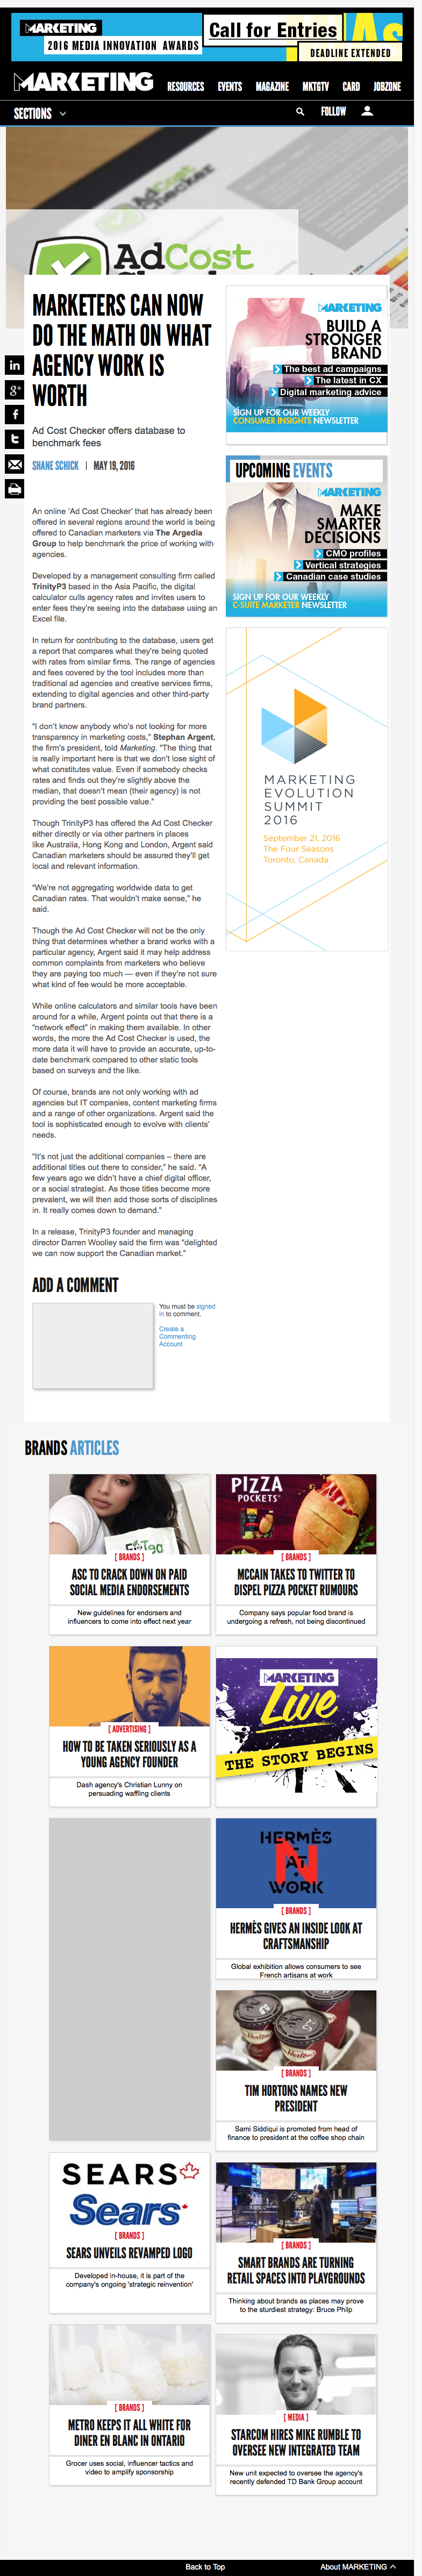 Publicity for TrinityP3   Media Links